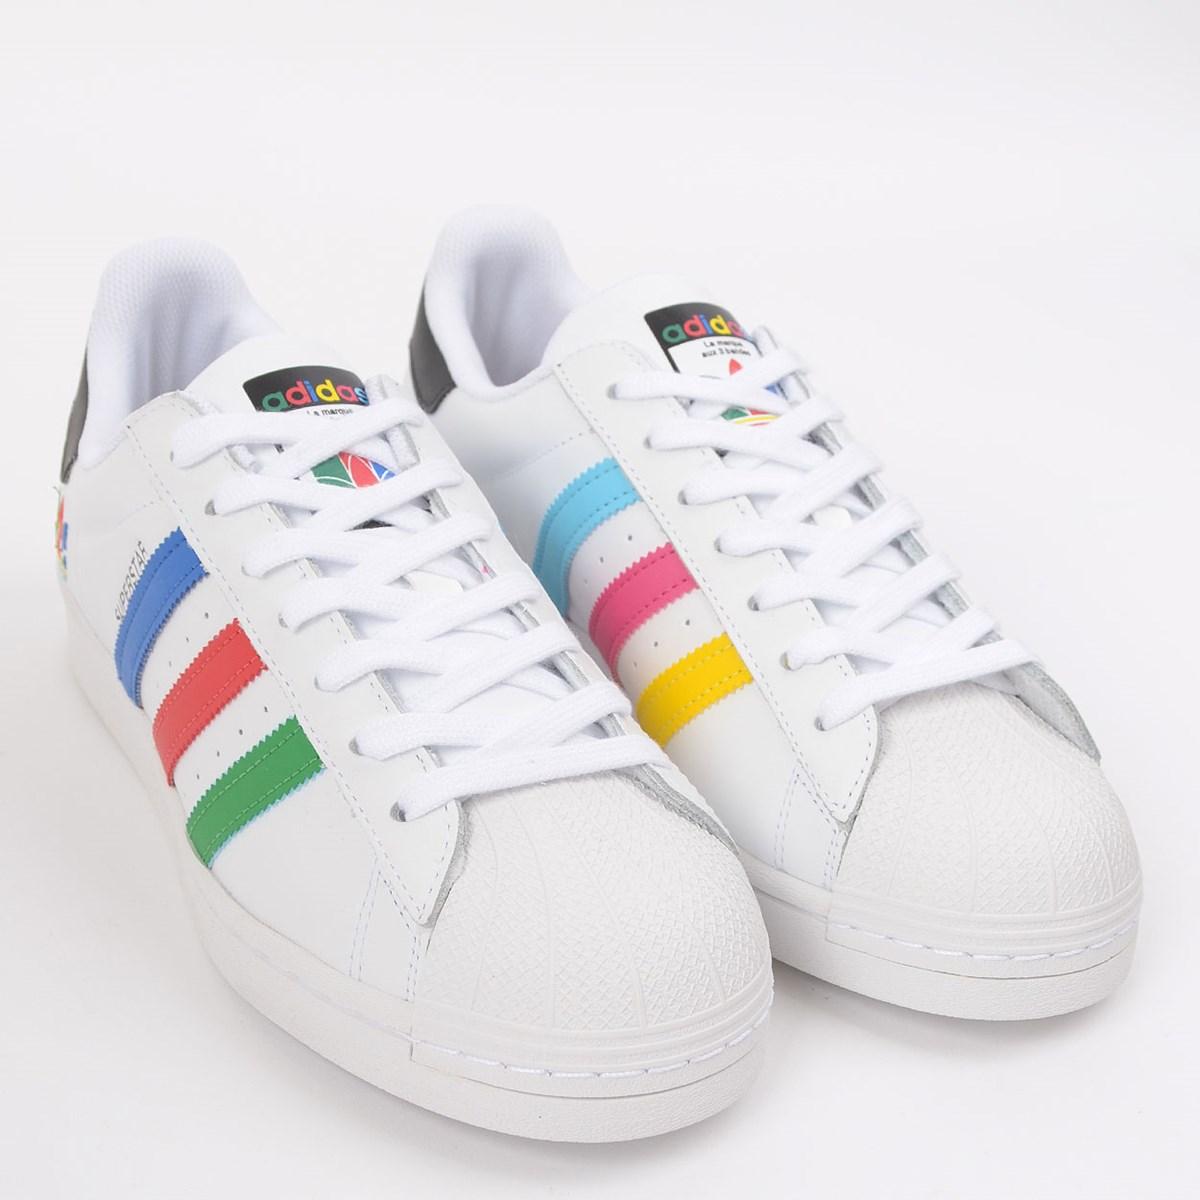 Tênis adidas Superstar Ftwr White Green FU9521